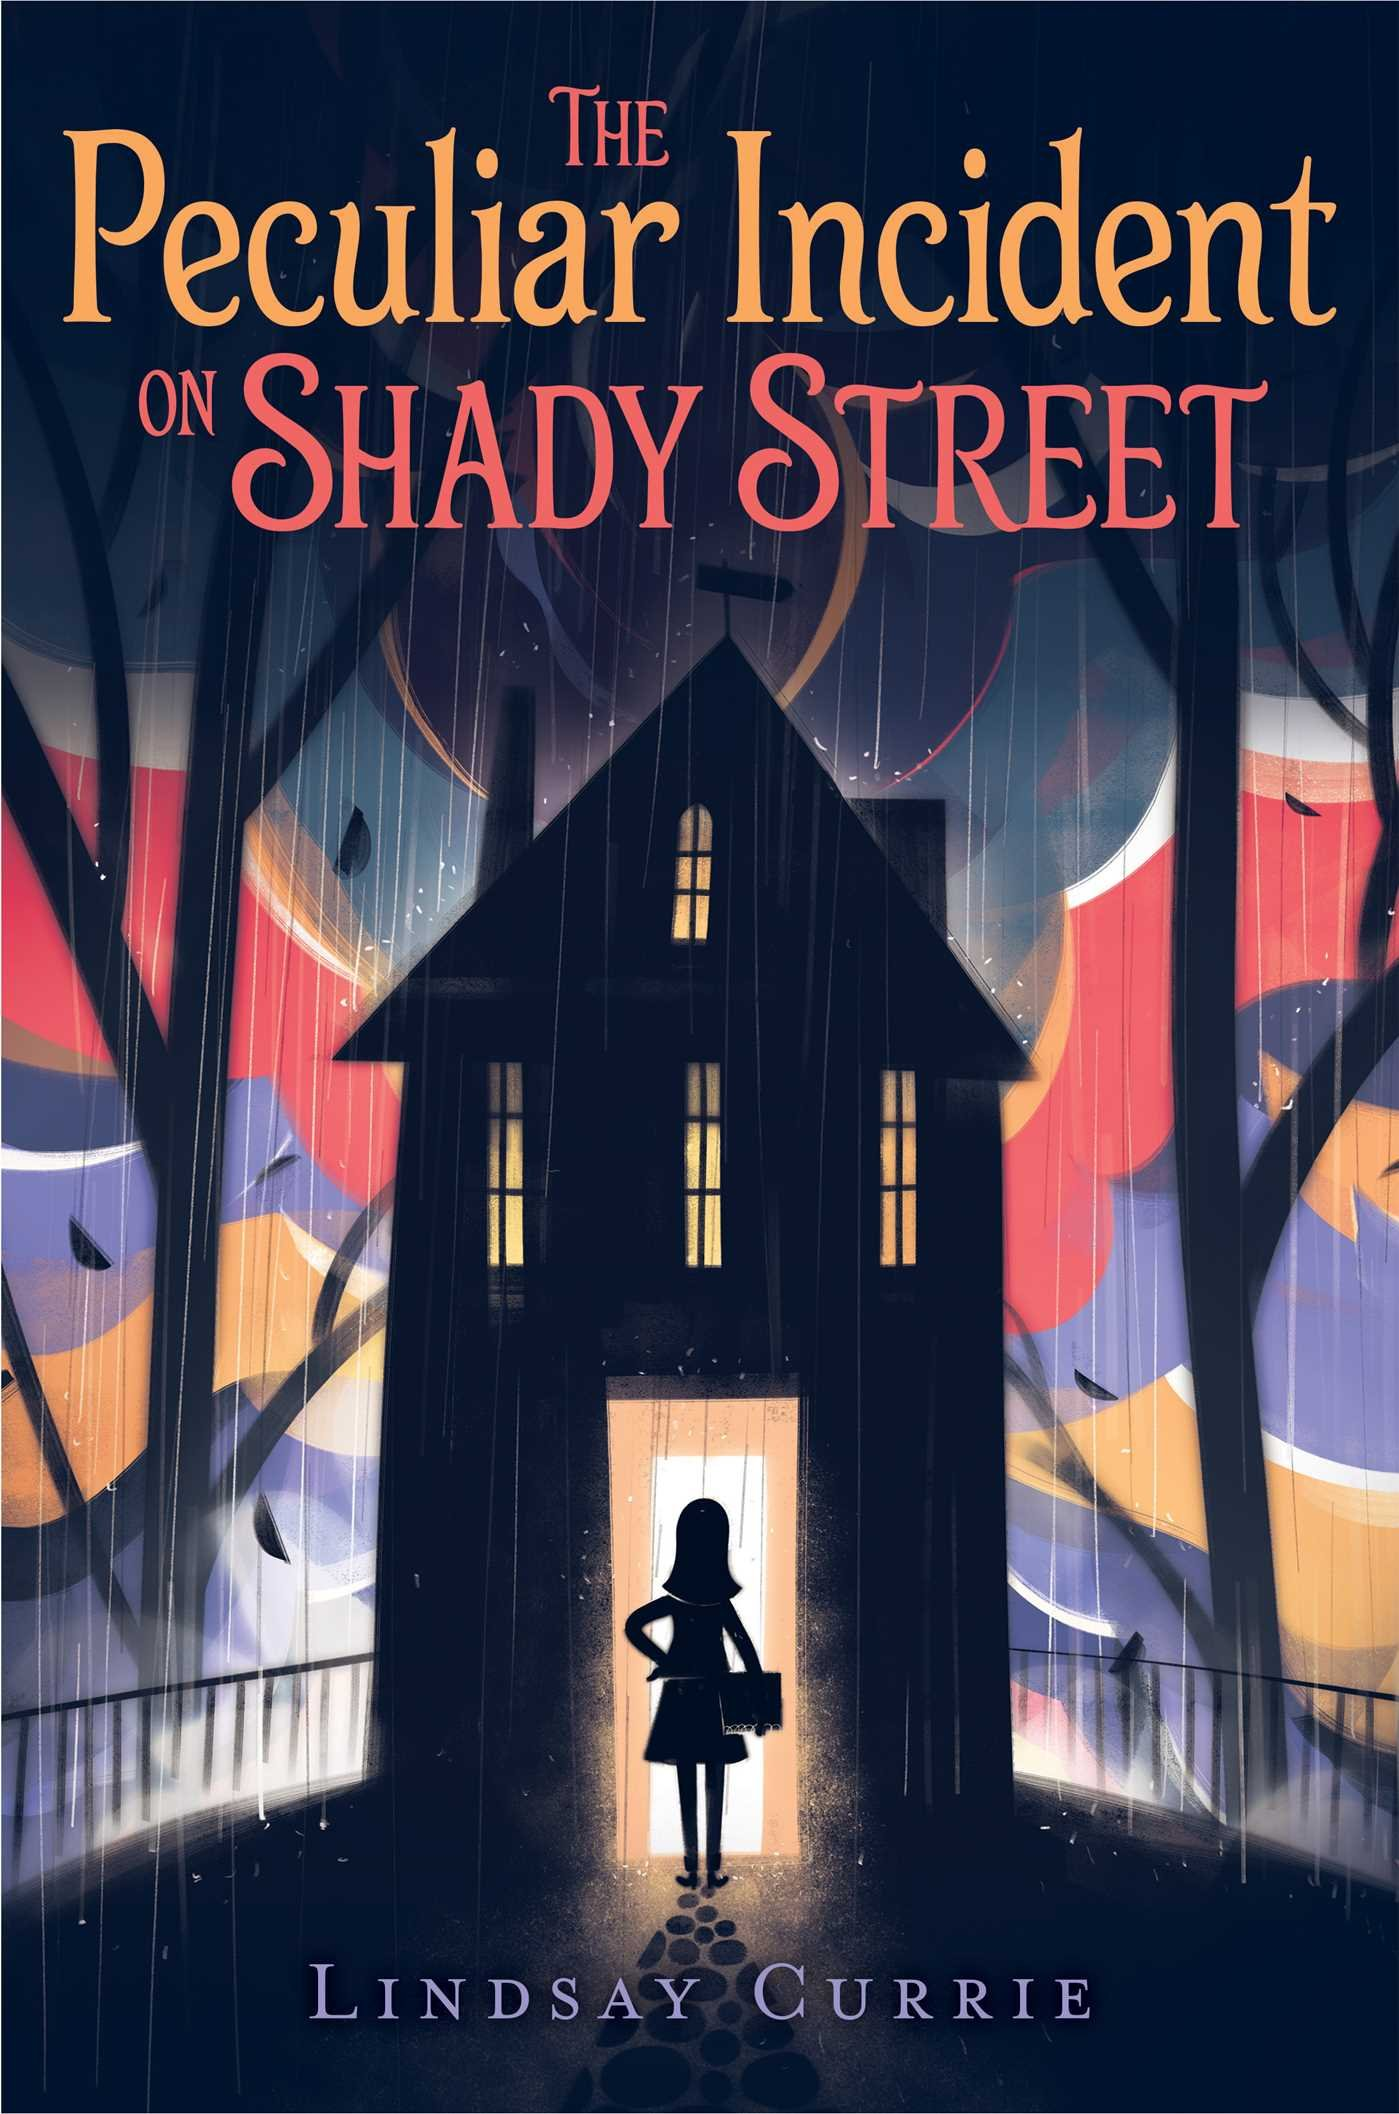 amazon the peculiar incident on shady street lindsay currie